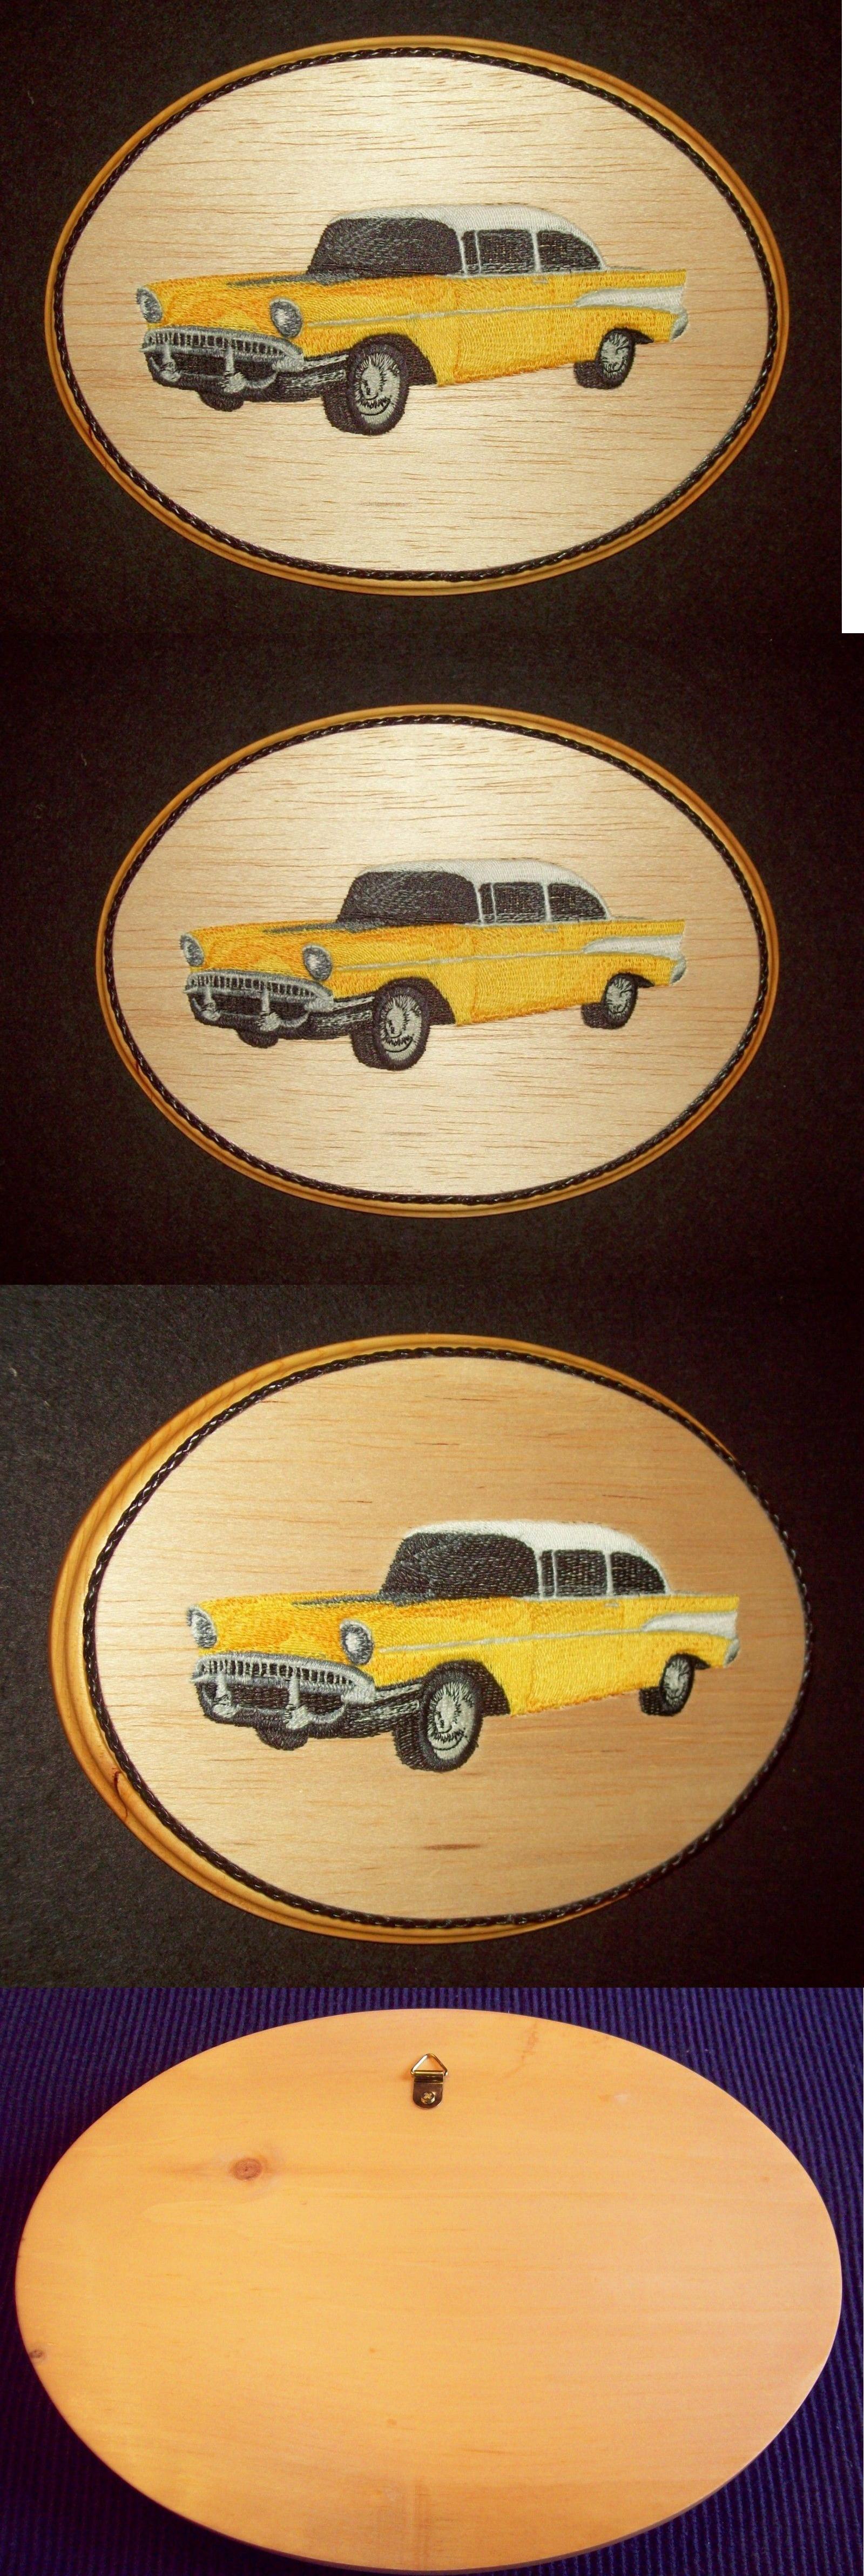 Enchanting Vintage Car Wall Decor Image - Wall Art Collections ...